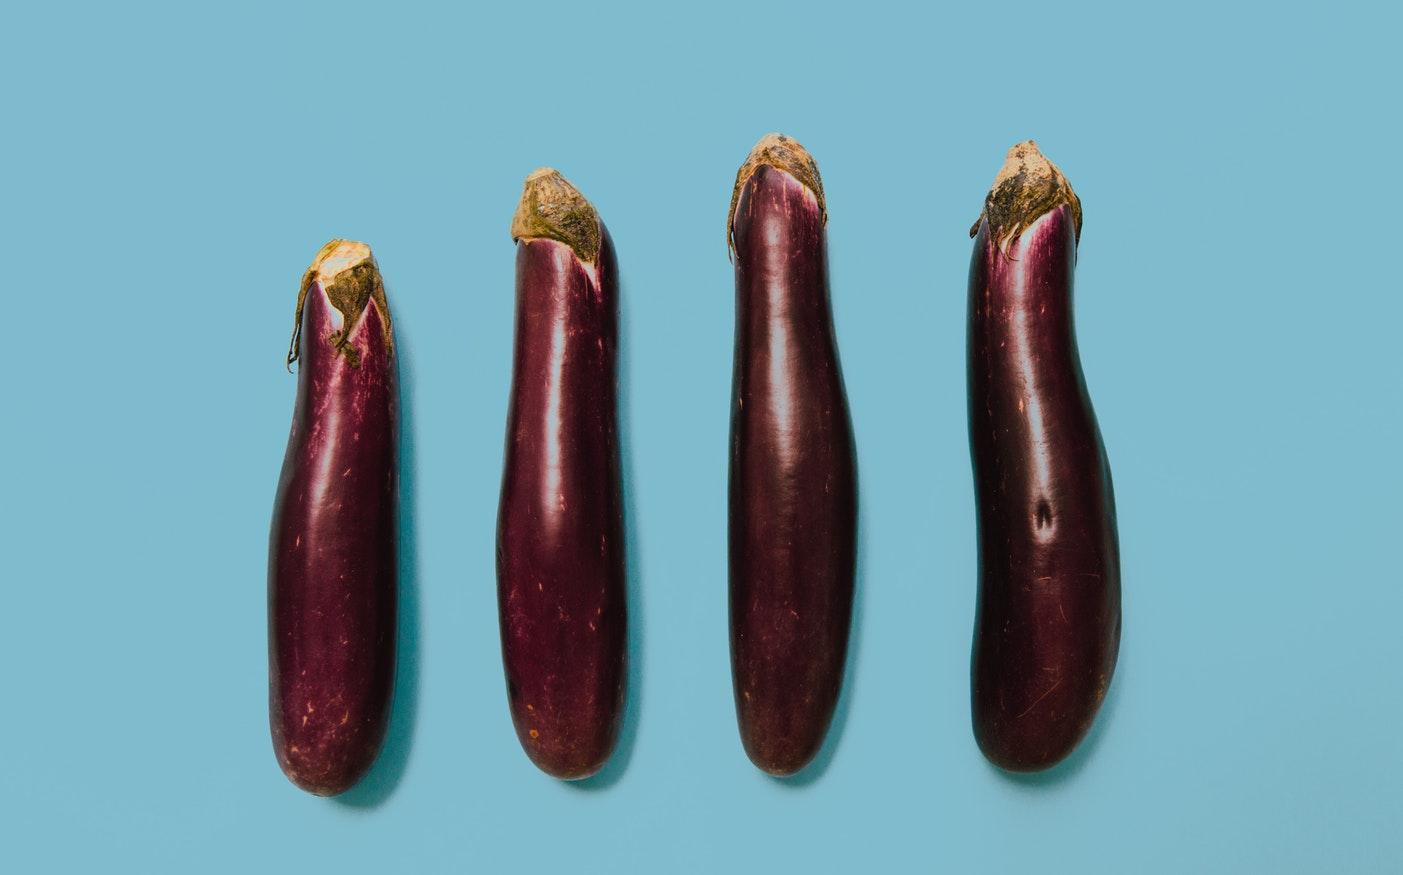 Beringela ou berinjela: qual a forma correta?